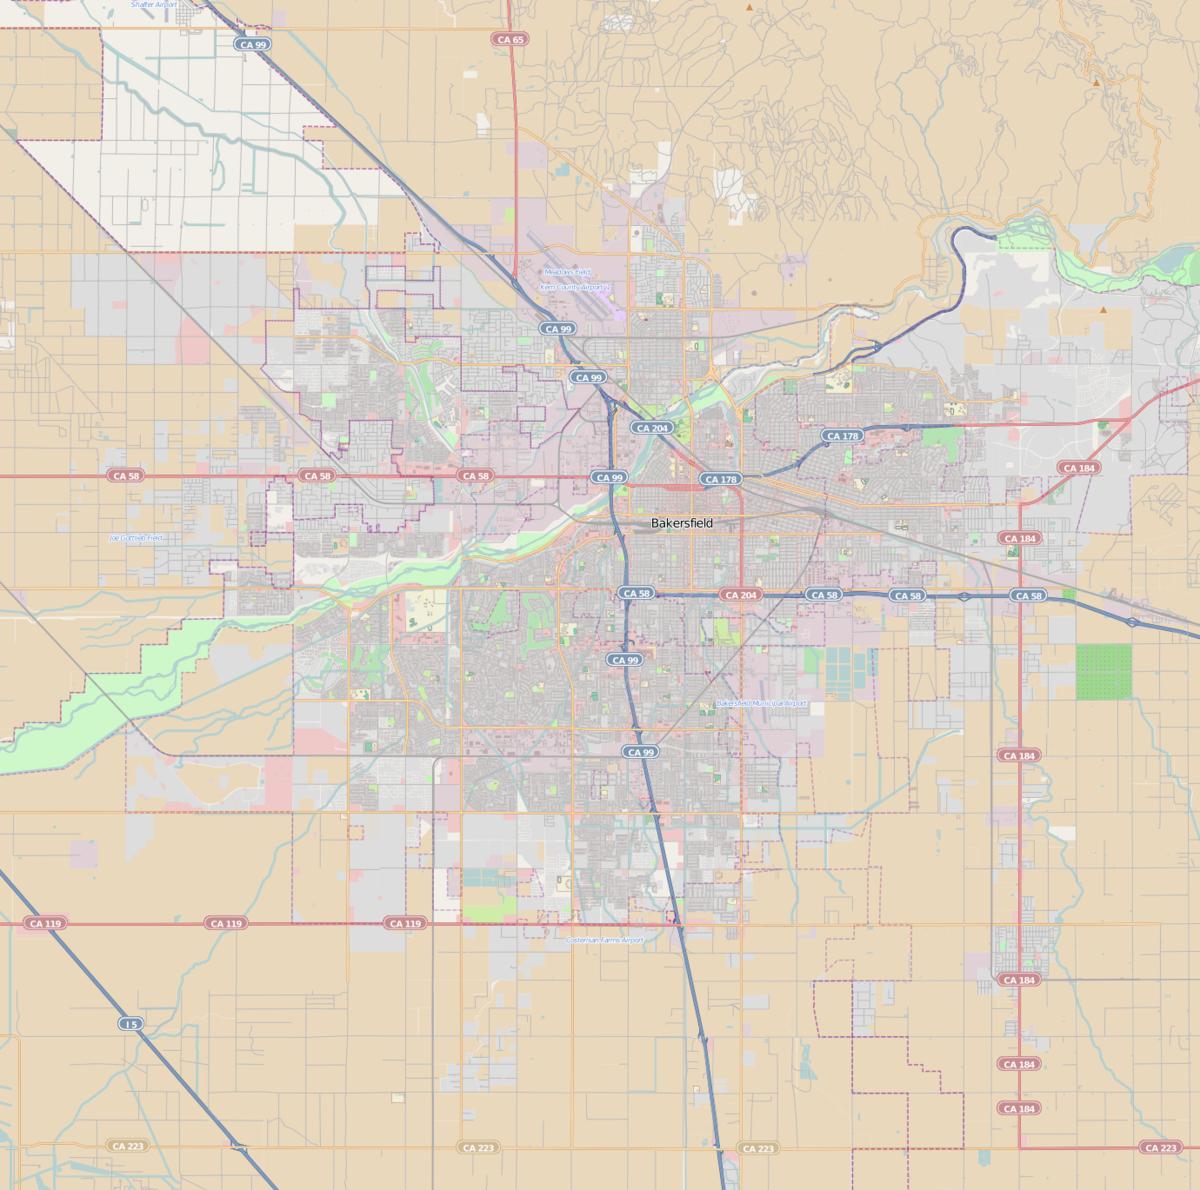 Bakersfield Station (Southern Pacific Railroad) - Wikipedia - California Train Map